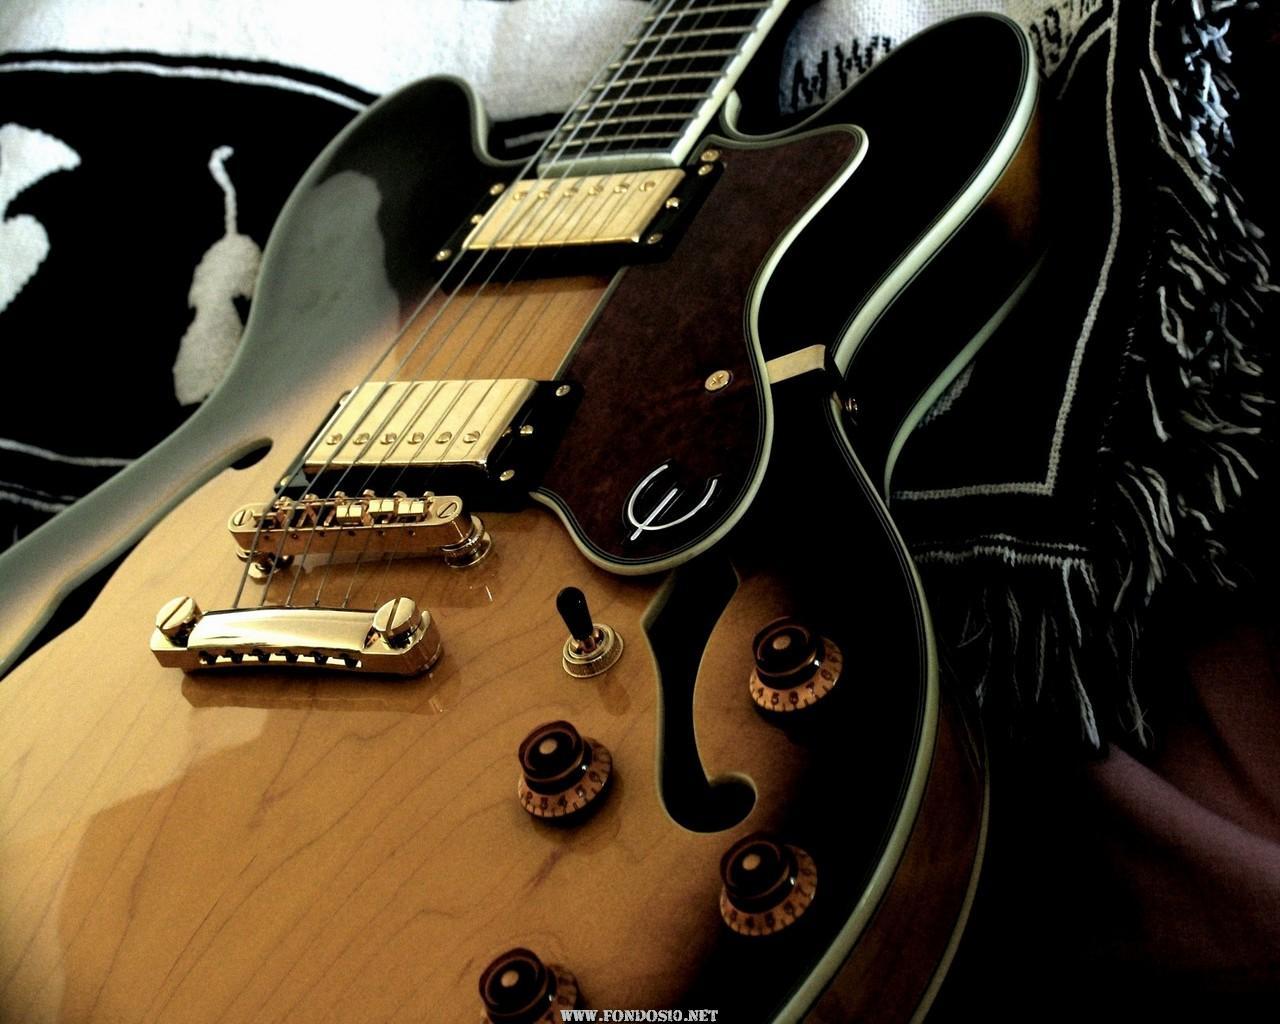 http://2.bp.blogspot.com/_yWIqiHjjNok/TP8YKgs2XhI/AAAAAAAAC74/7mJj-1DPv8I/s1600/Guitarra_Electrica.jpeg